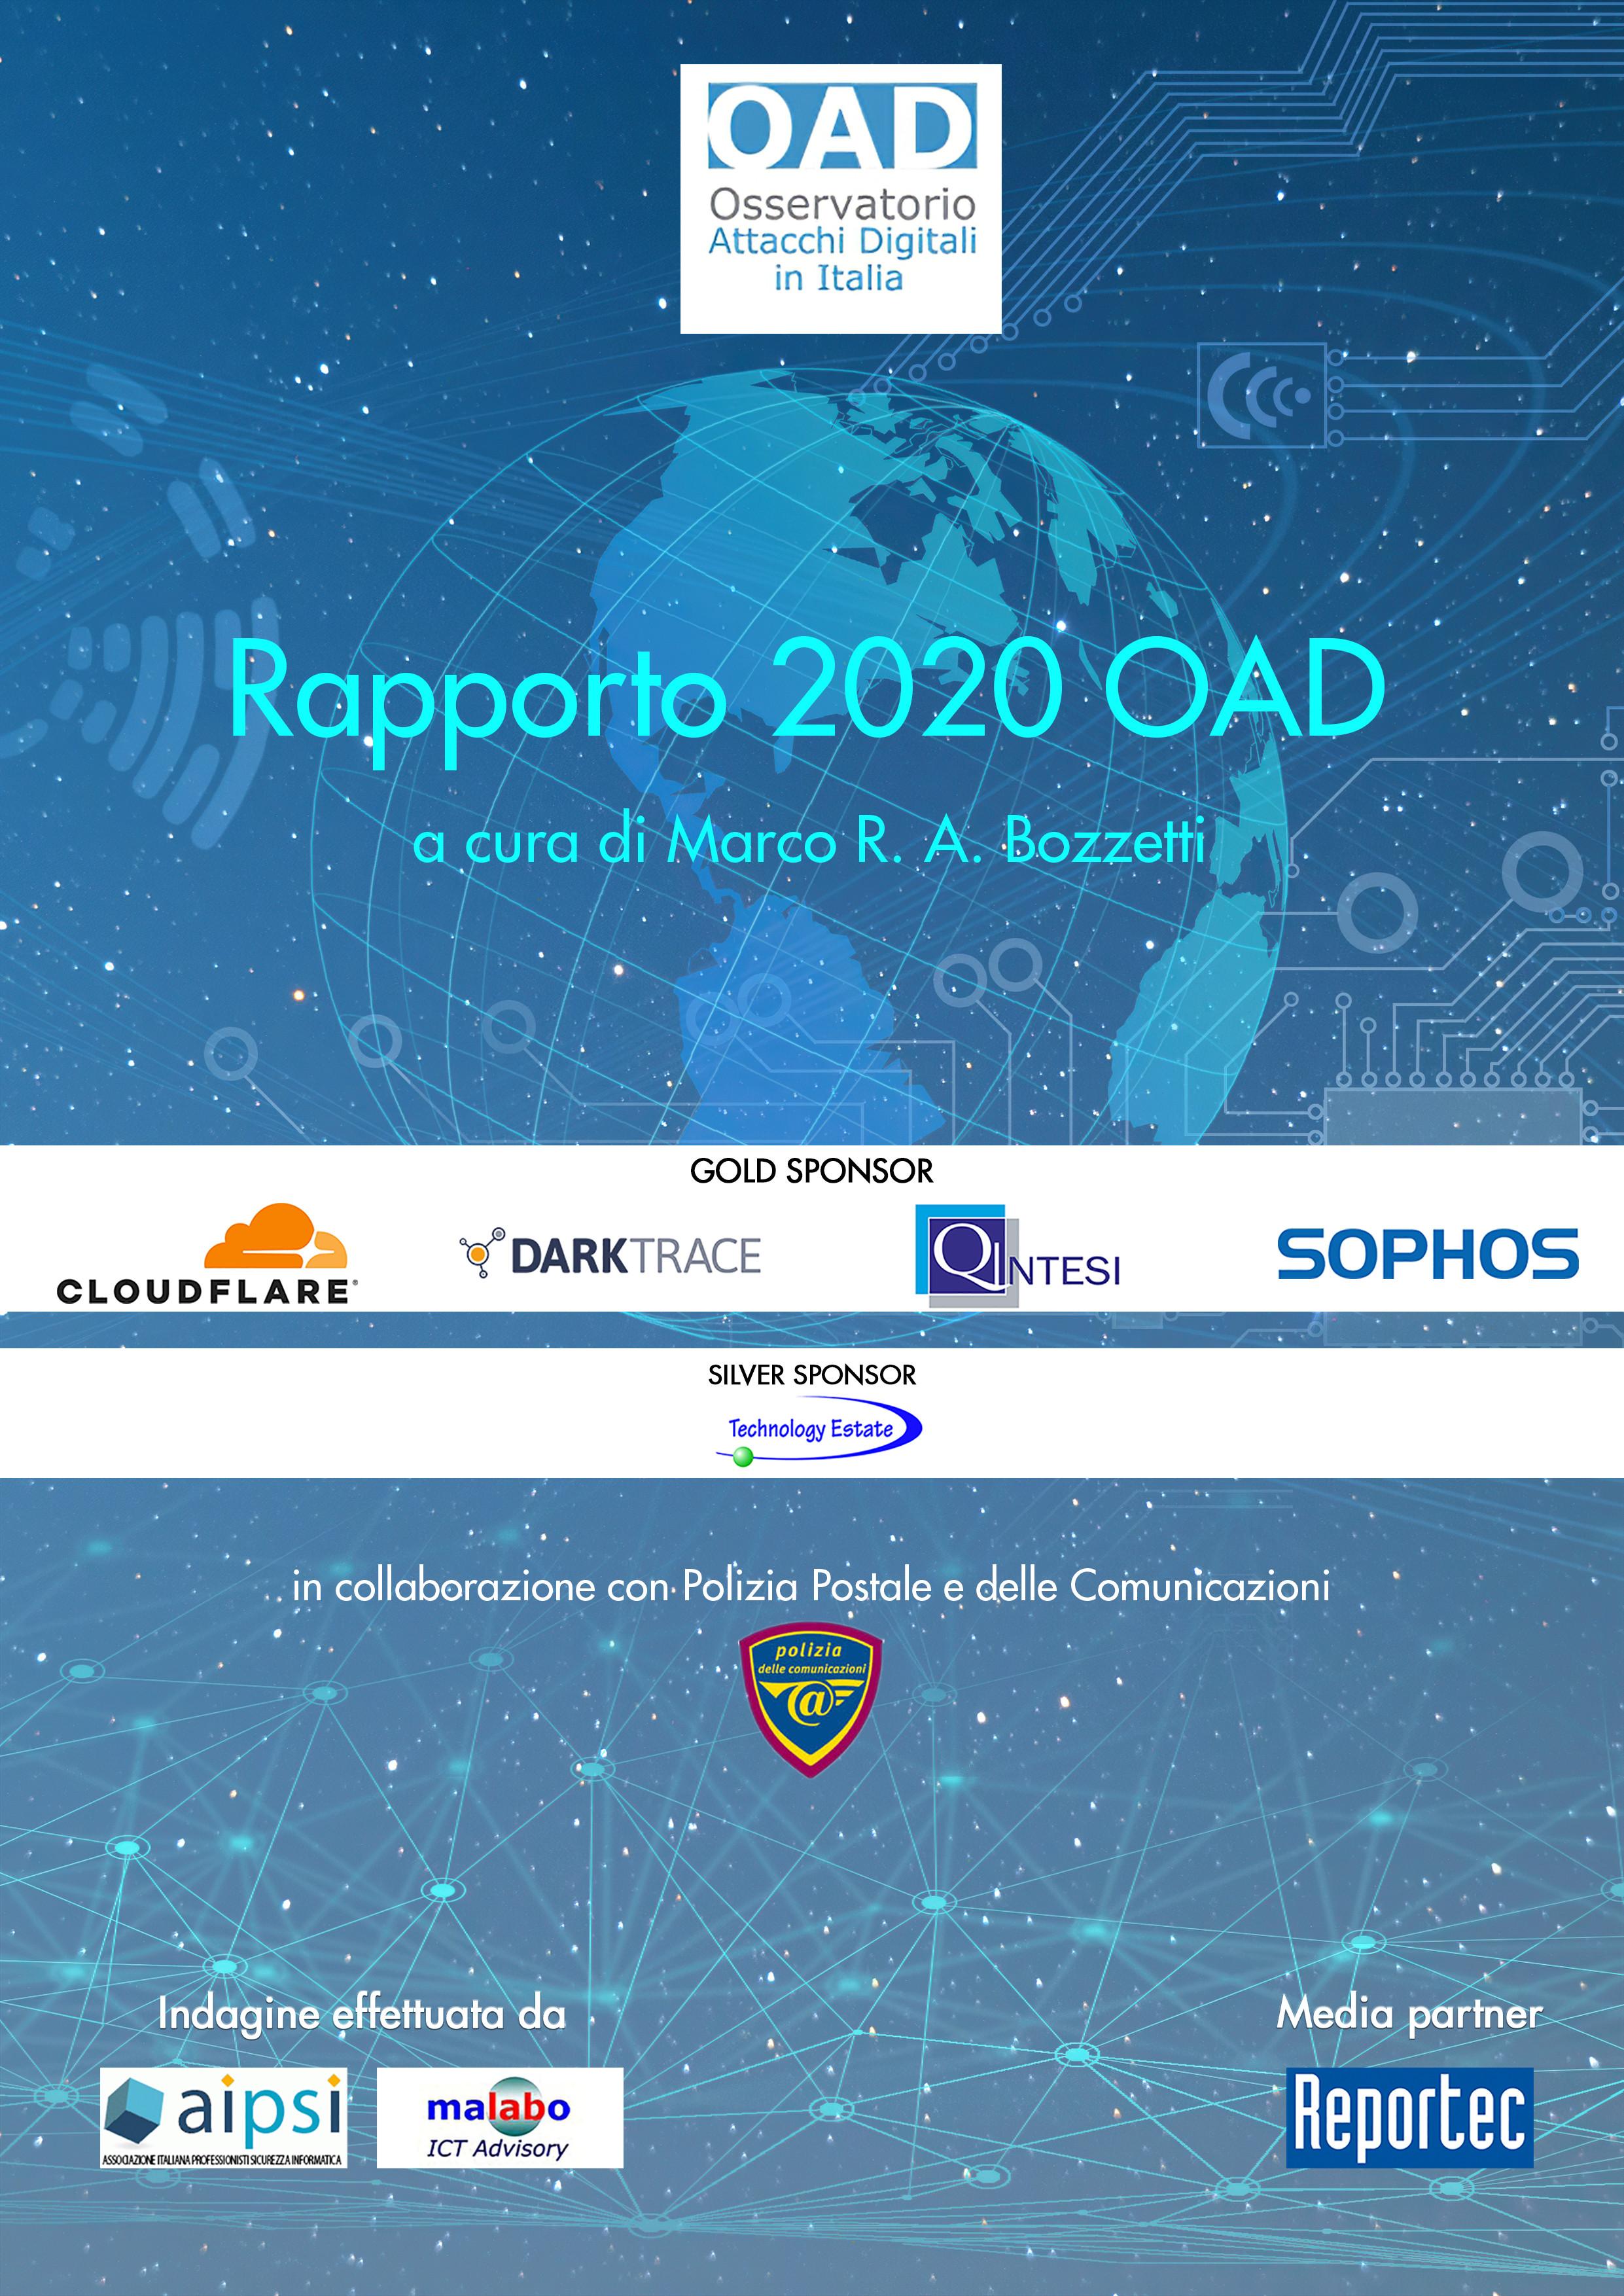 Copertina_OAD_2020_rid